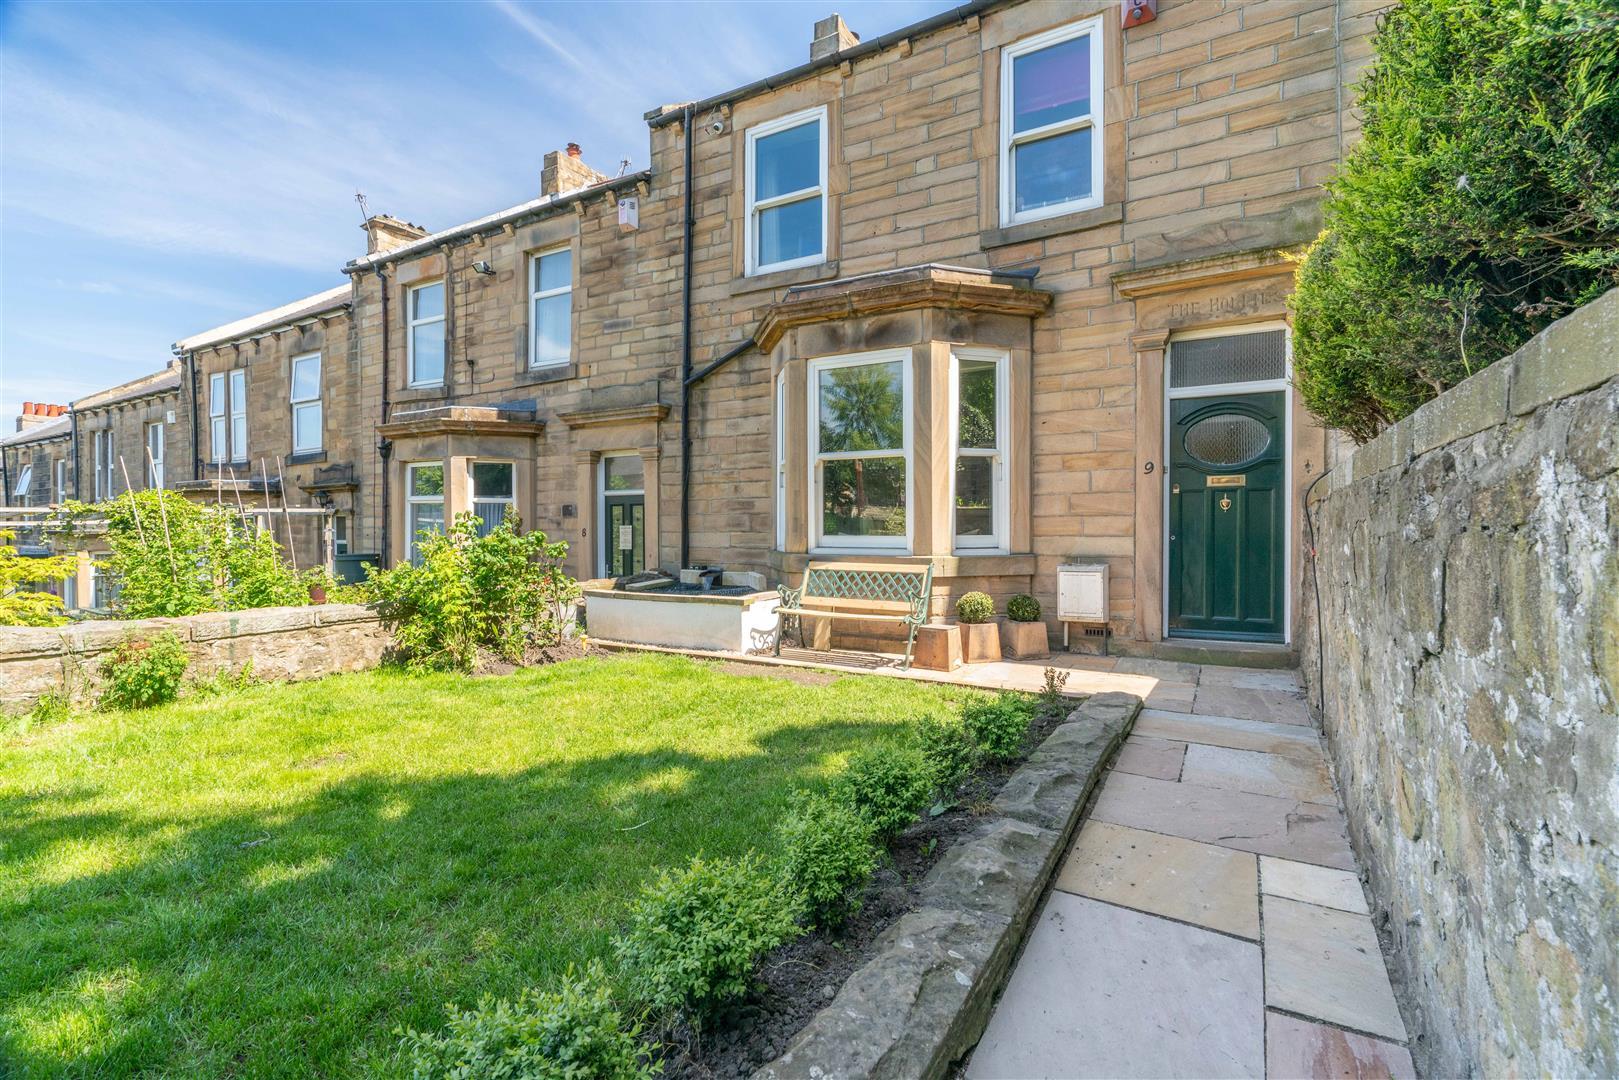 3 bed terraced house for sale in Thorneyholme Terrace, Blaydon-On-Tyne, NE21